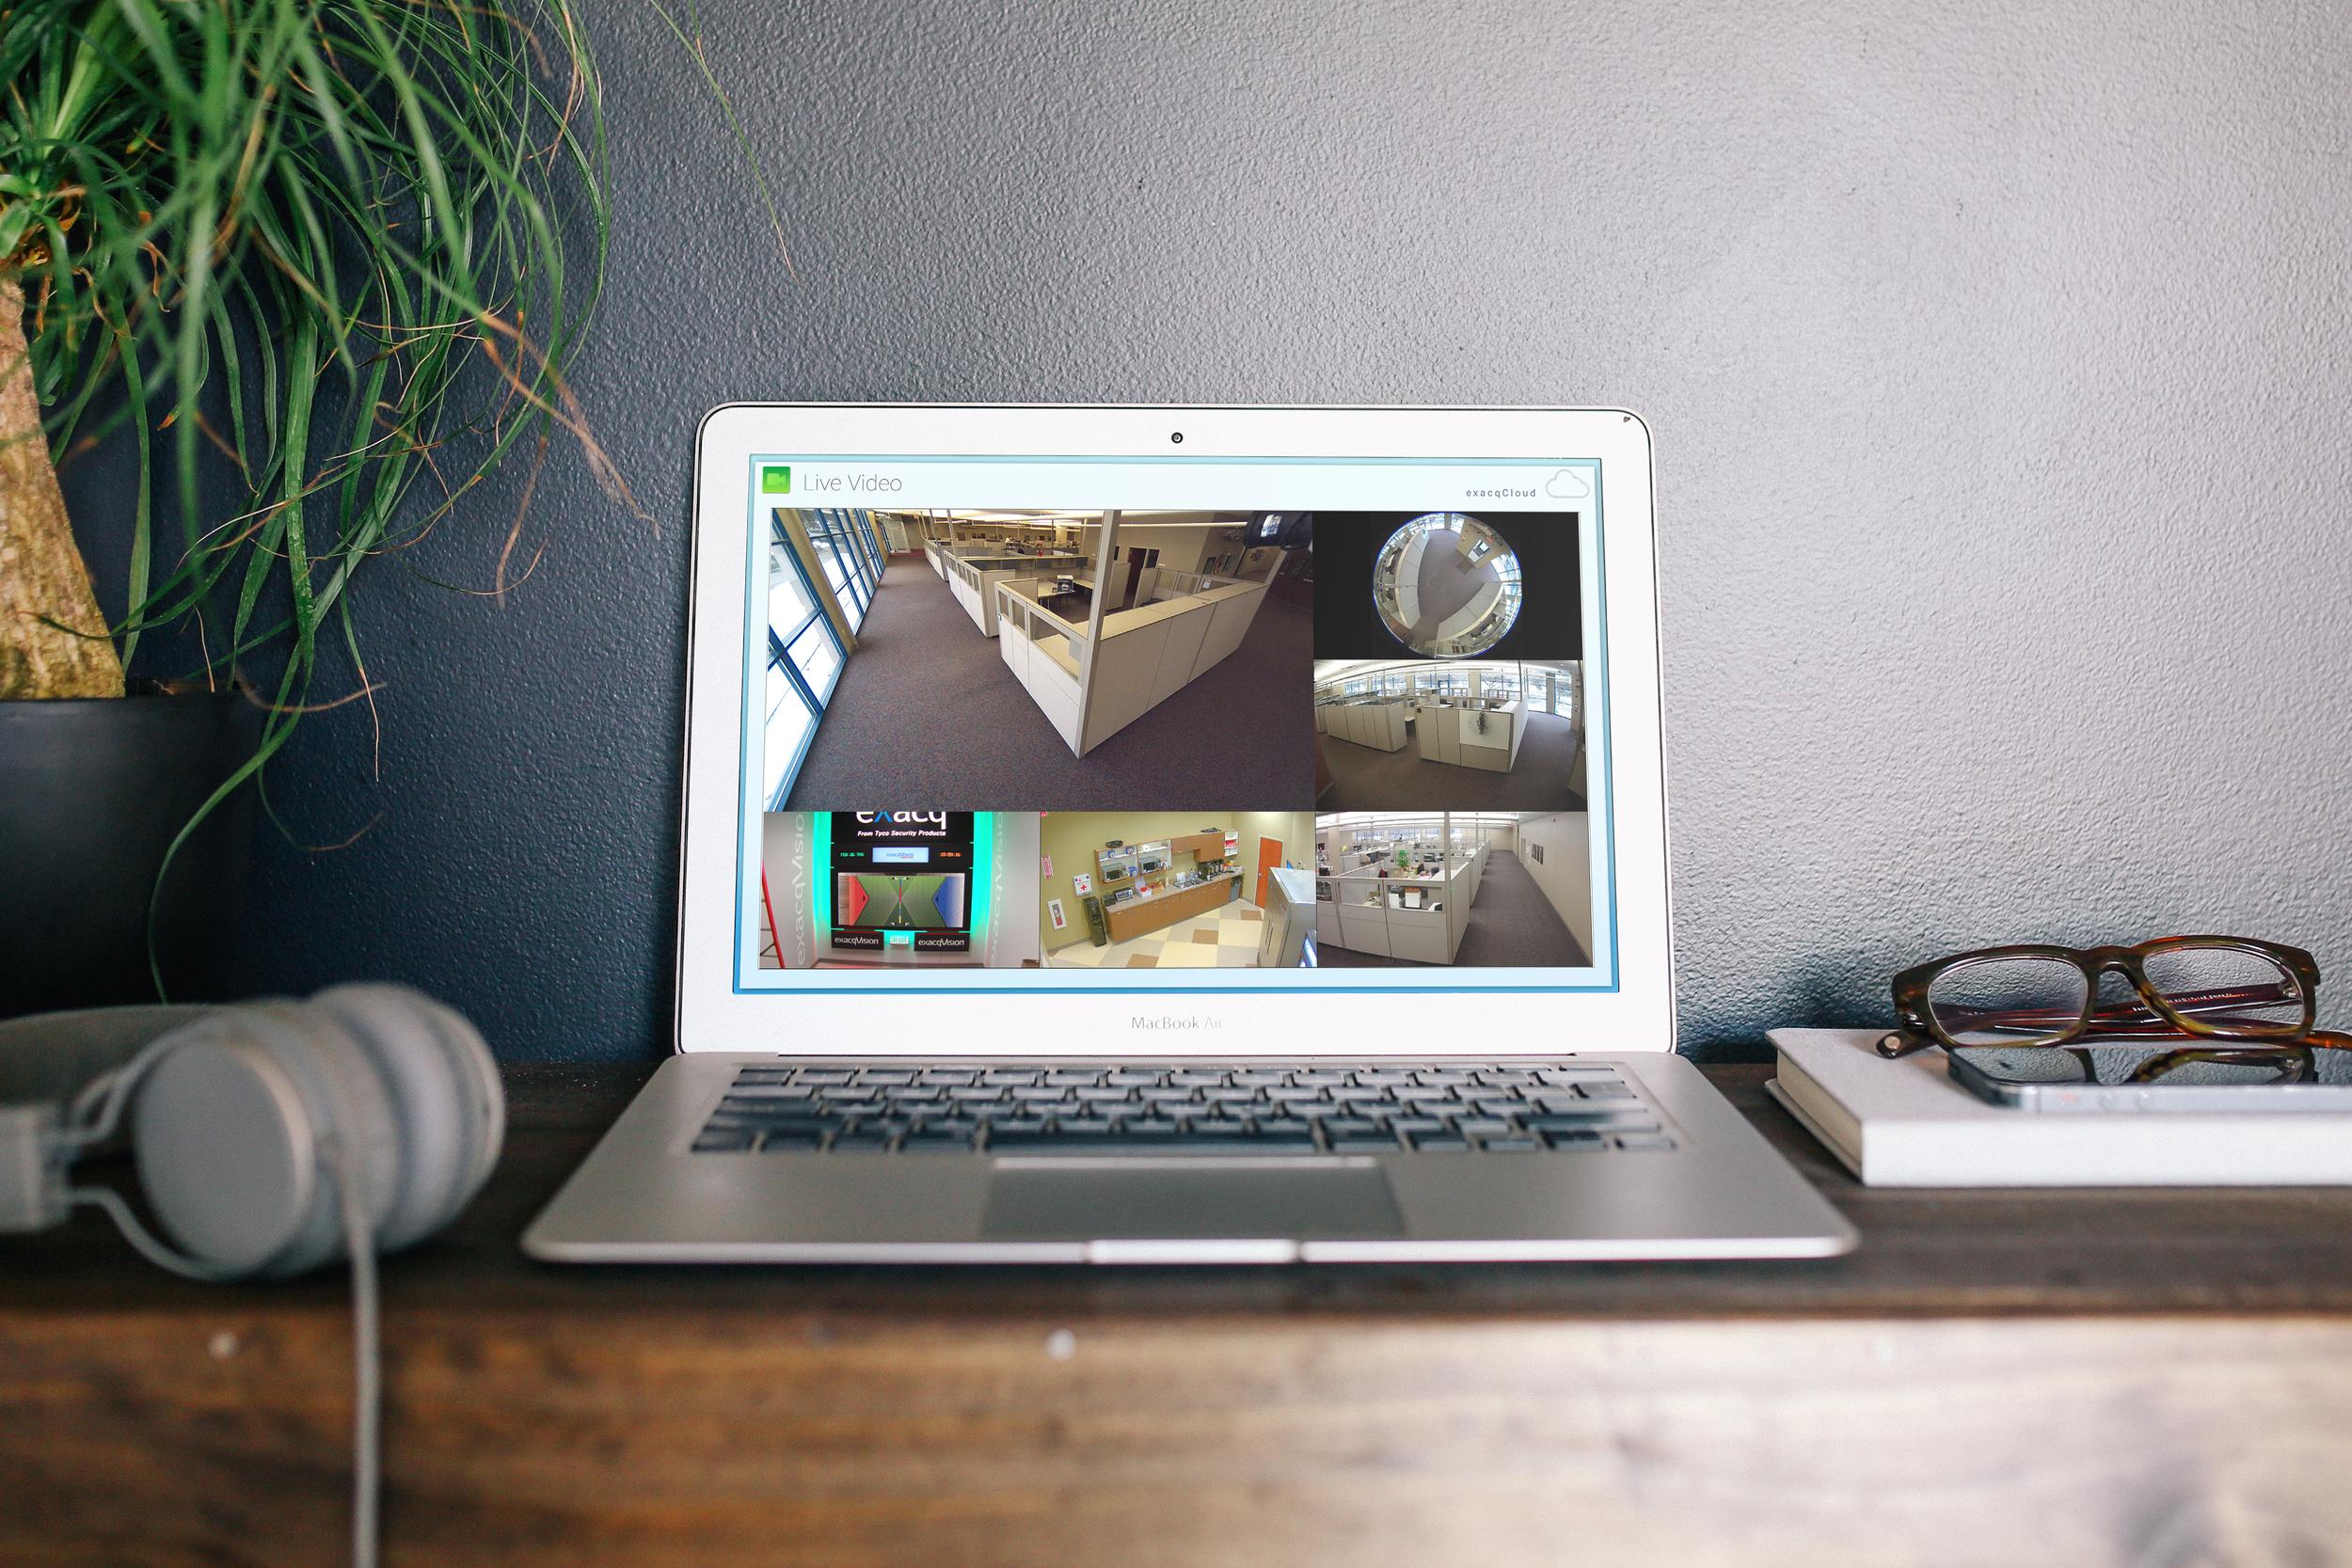 macbook-4 (1).jpg